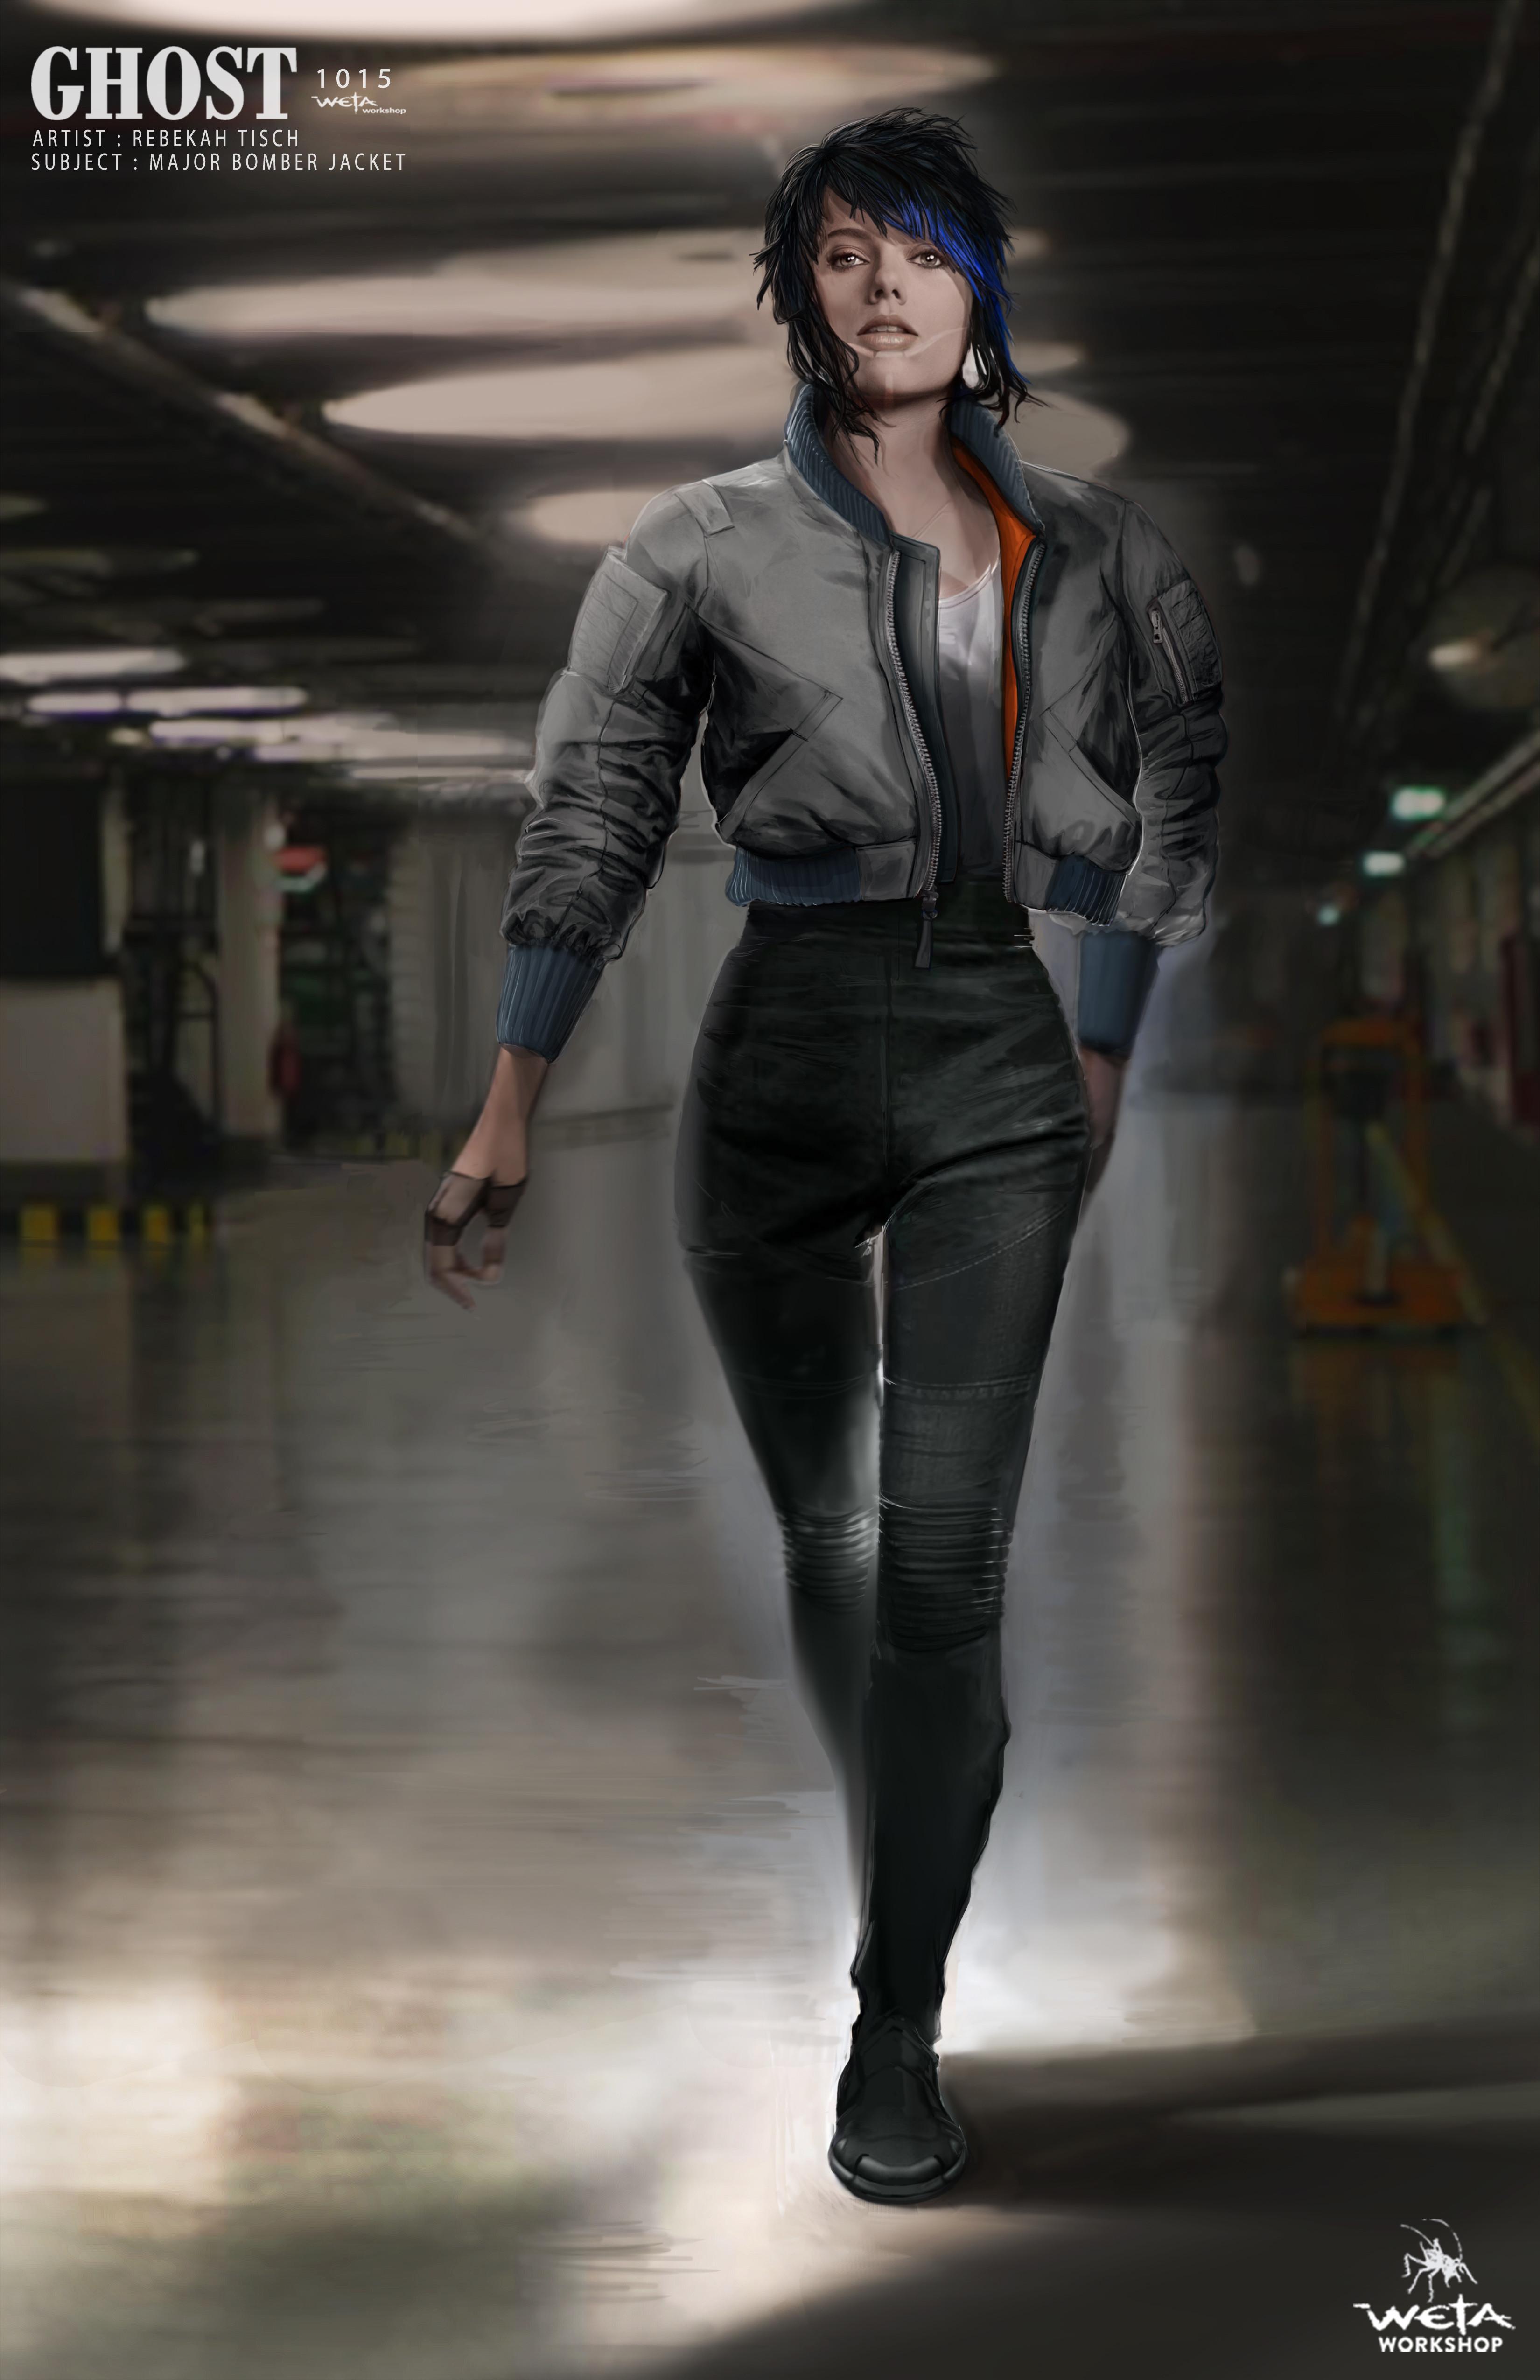 Major Bomber Jacket - Artist: Rebekah Tisch